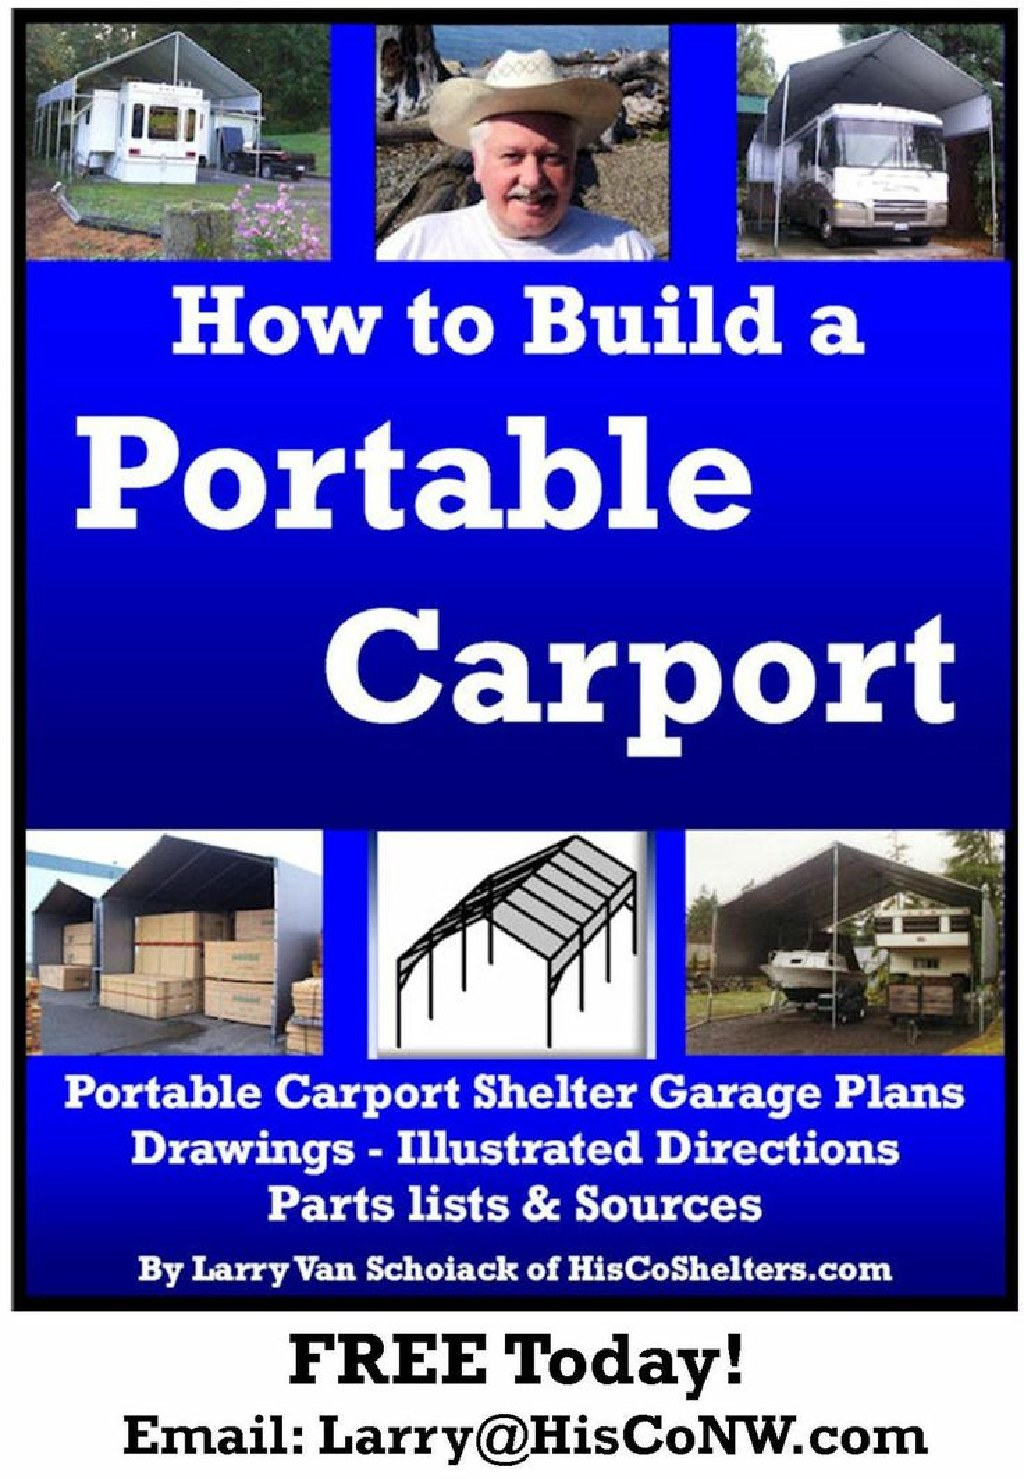 Build-Your-Own Portable Carport (EBook)